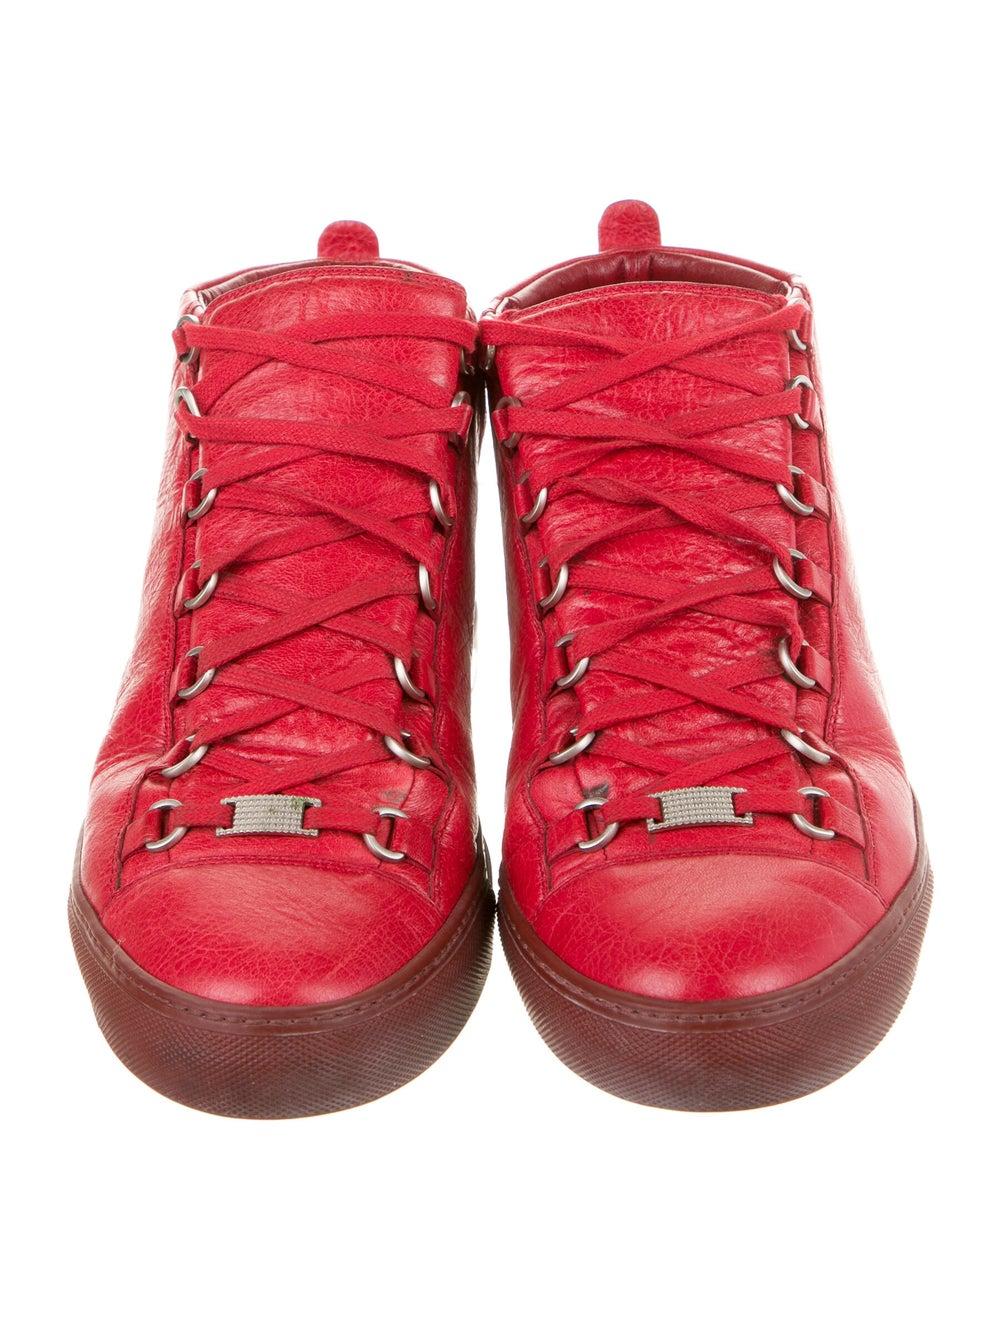 Balenciaga Arena Sneakers Sneakers Red - image 3